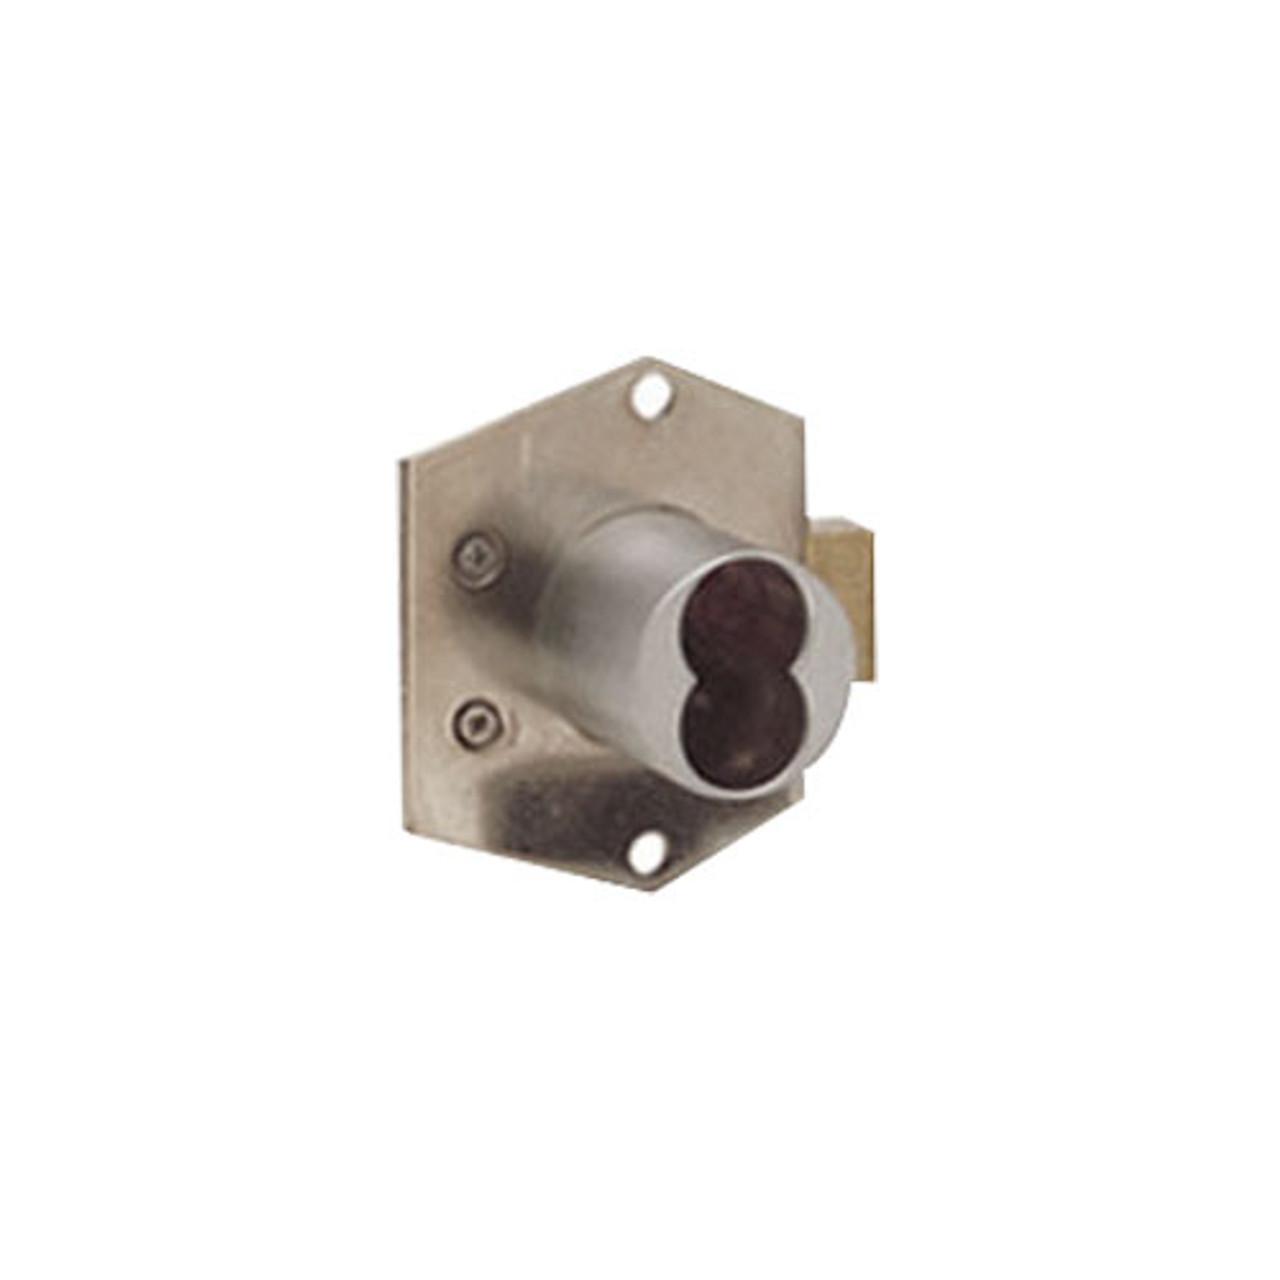 Olympus 725RD-DW-IH-26D Rim Mount Deadbolt Cabinet Locks in Satin Chrome Finish